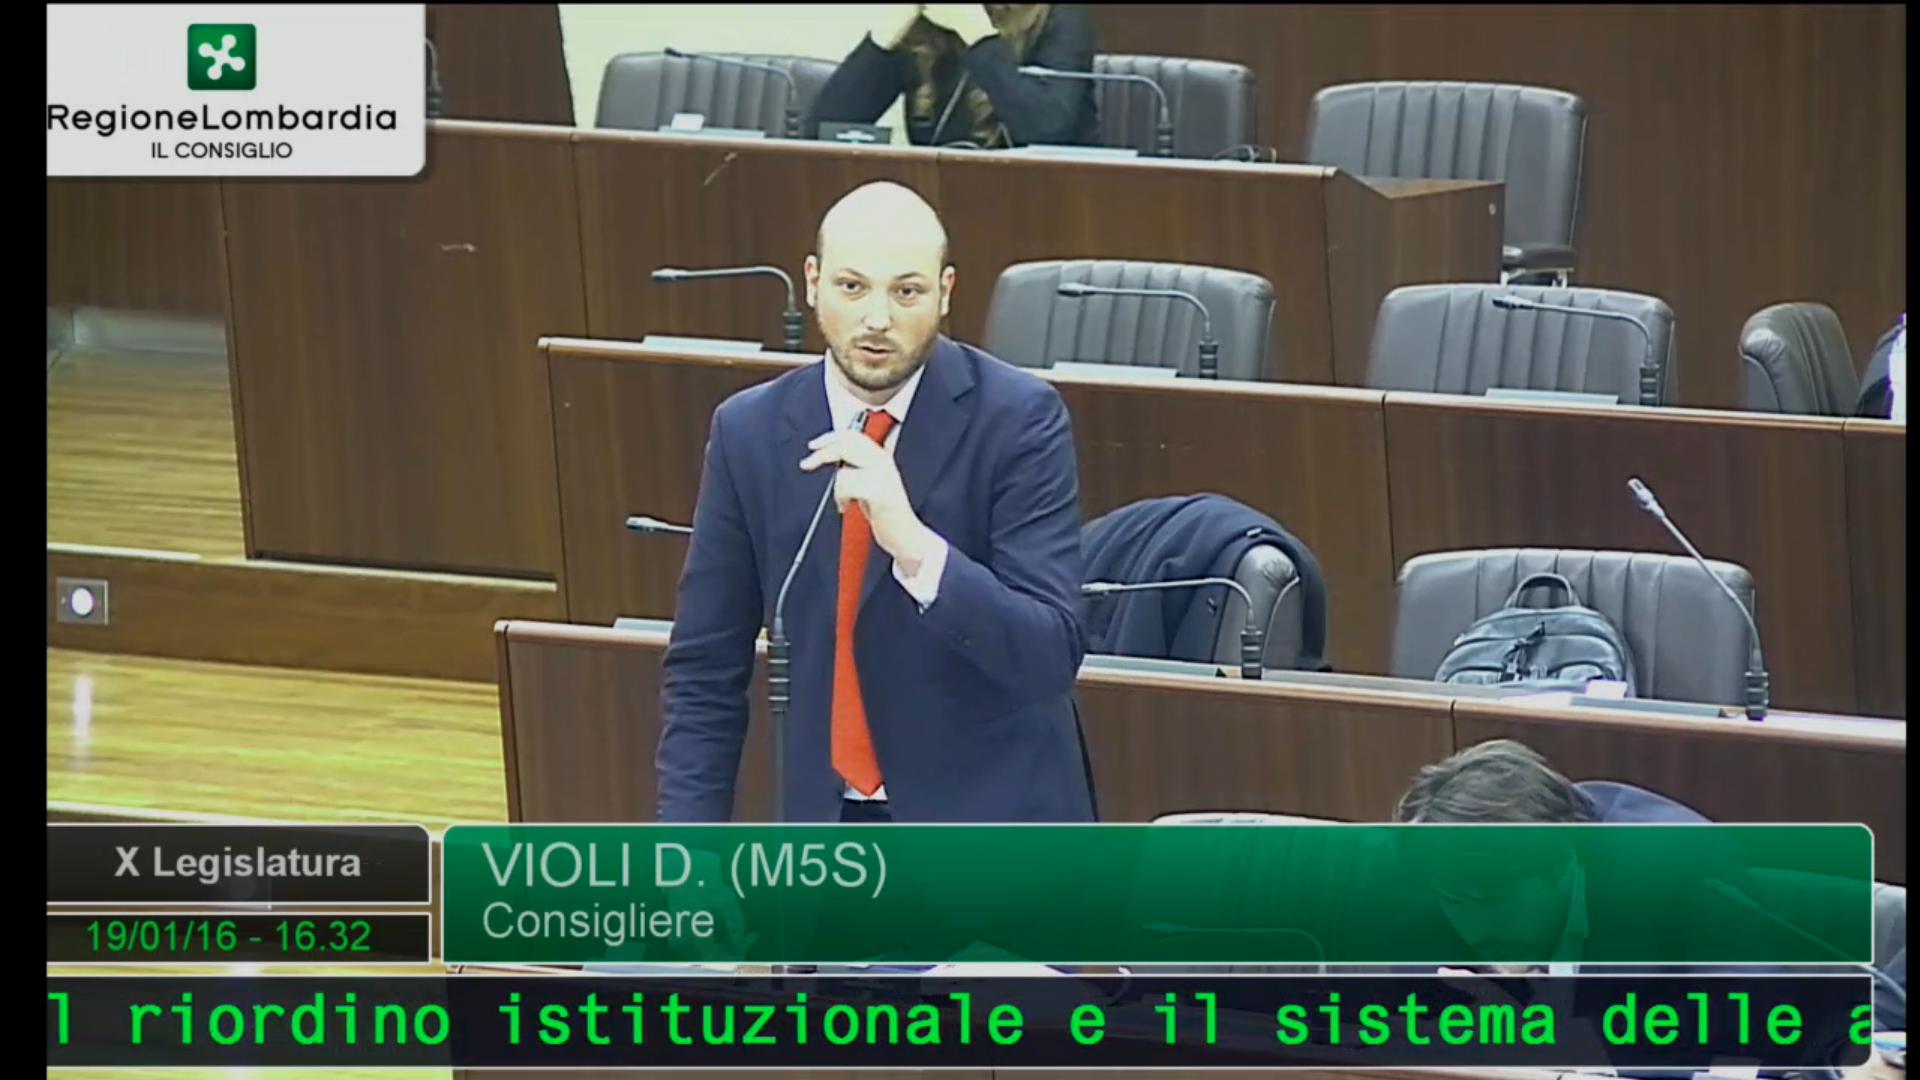 Riforme costituzionali: nessuna sponda al centralismo di Renzi